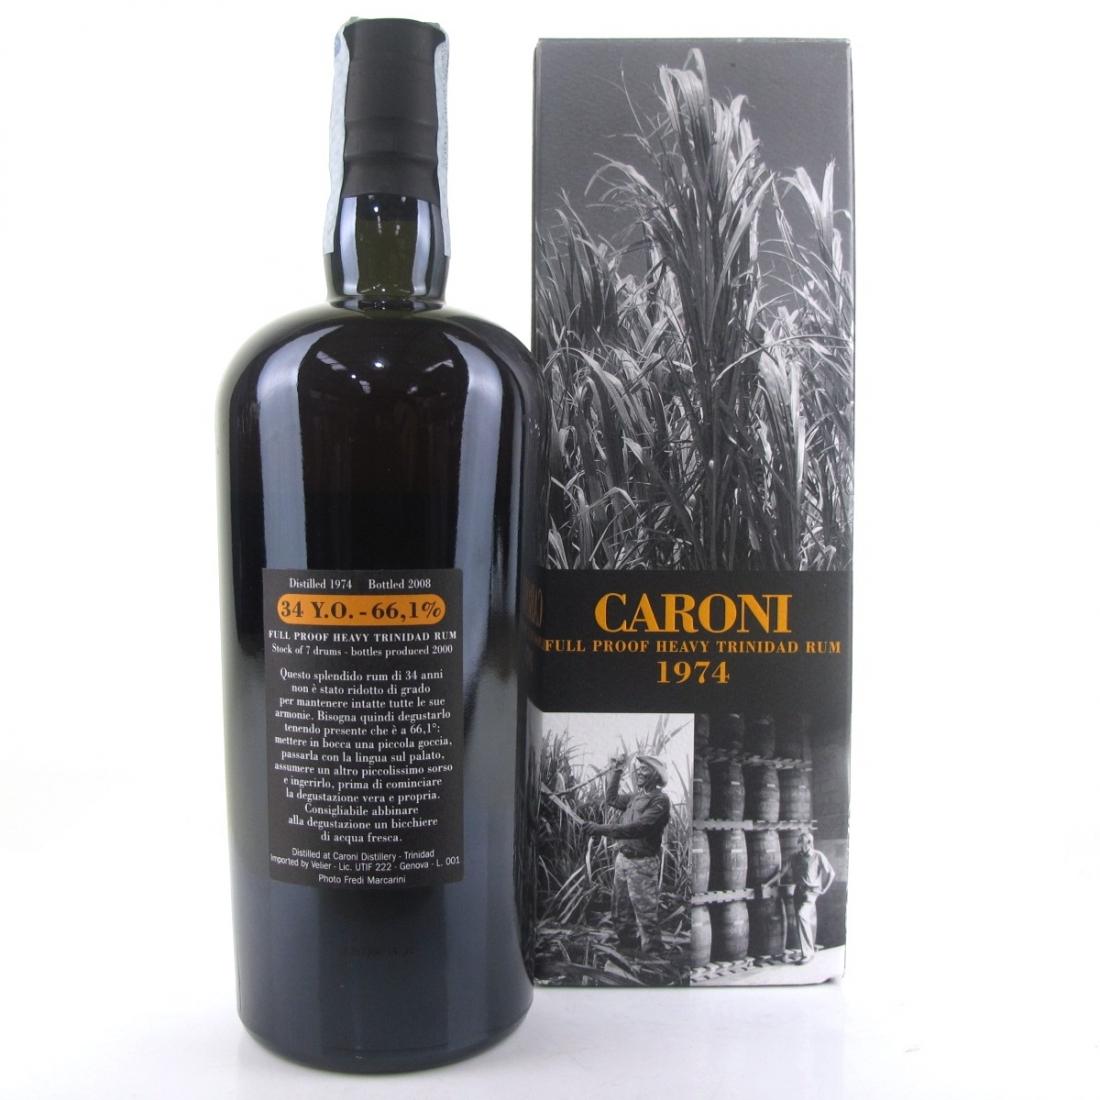 Caroni 1974 Full Proof 34 Year Old Heavy Trinidad Rum